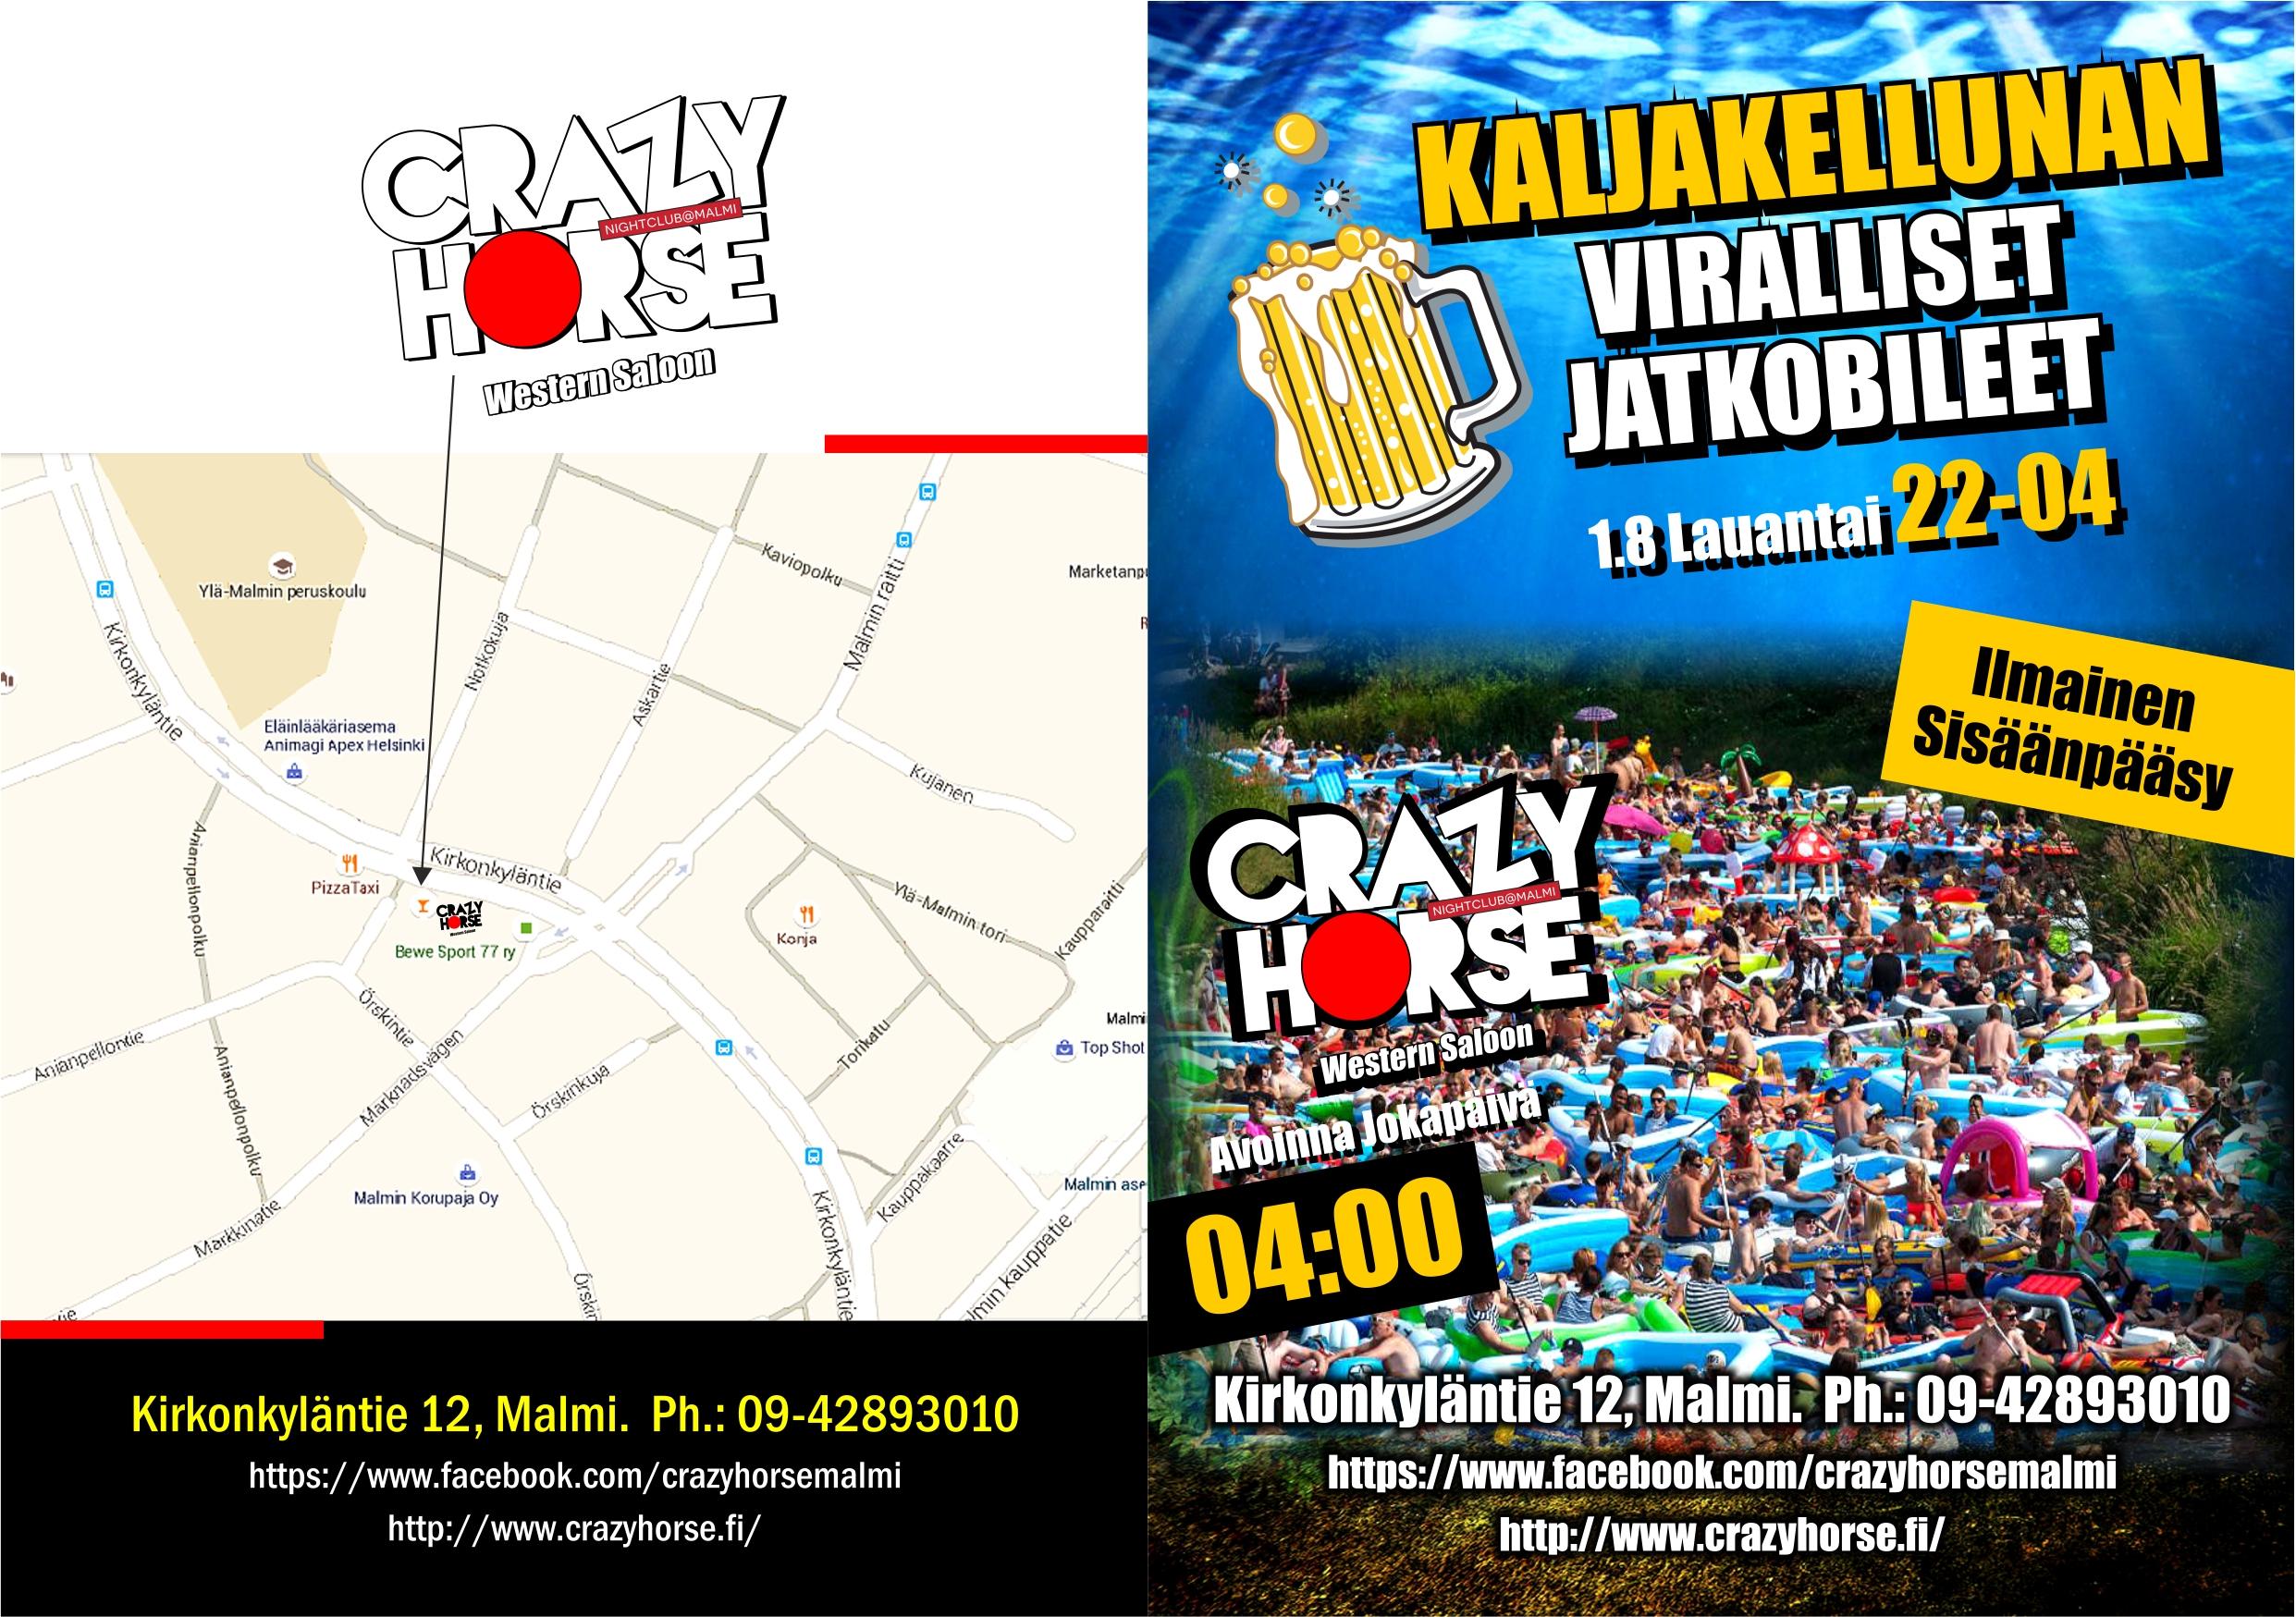 crazy-horse-kaljakellunta-front-back-combined-jpg-1